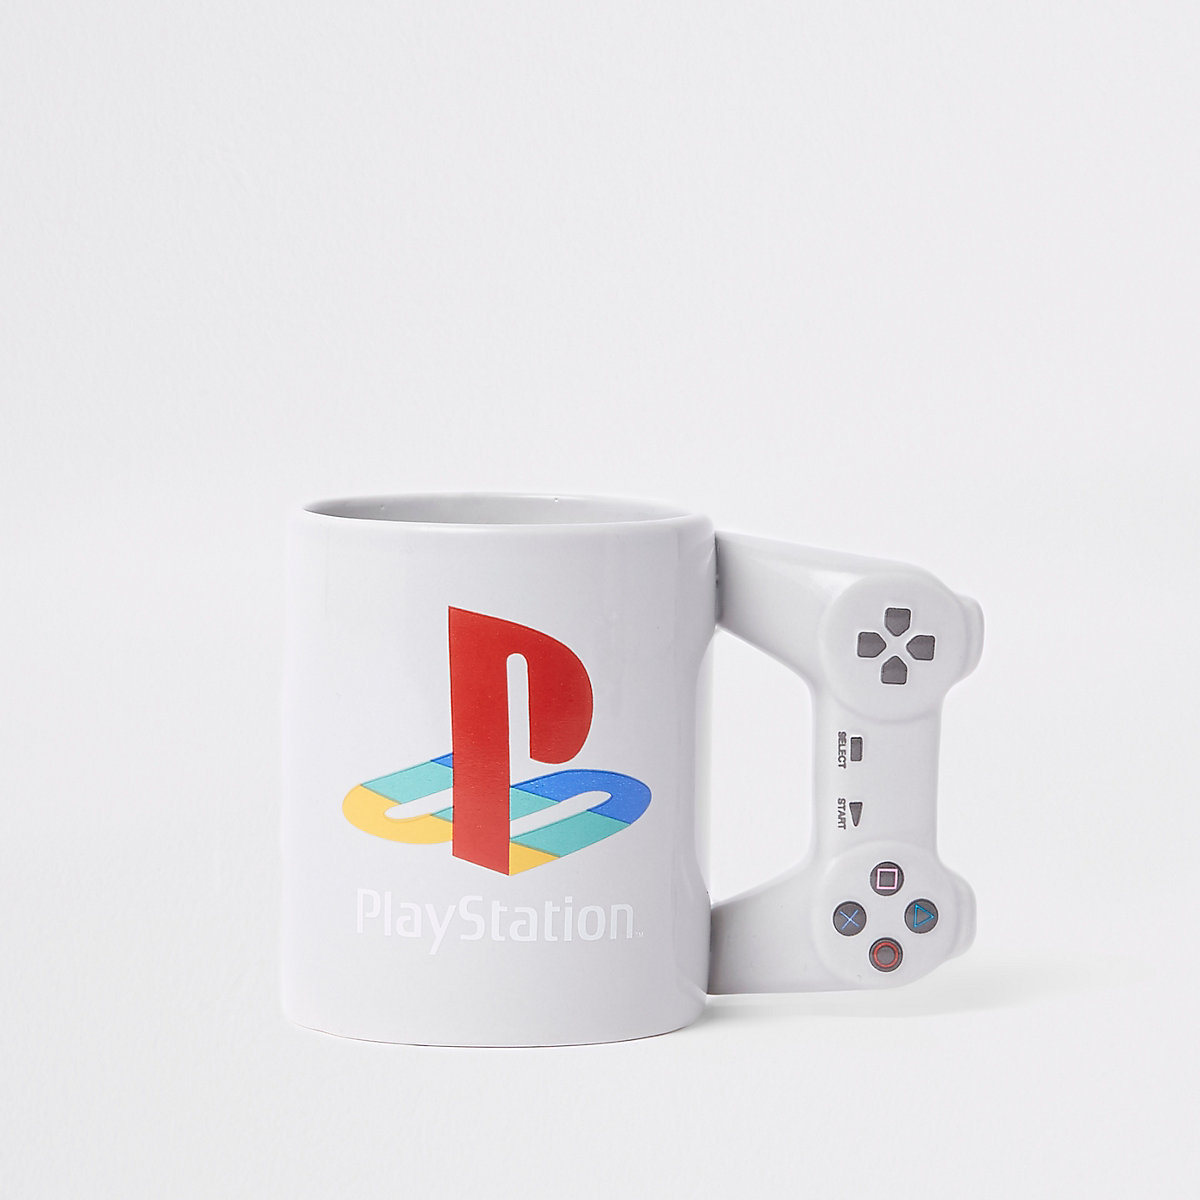 Grey PlayStation controller mug